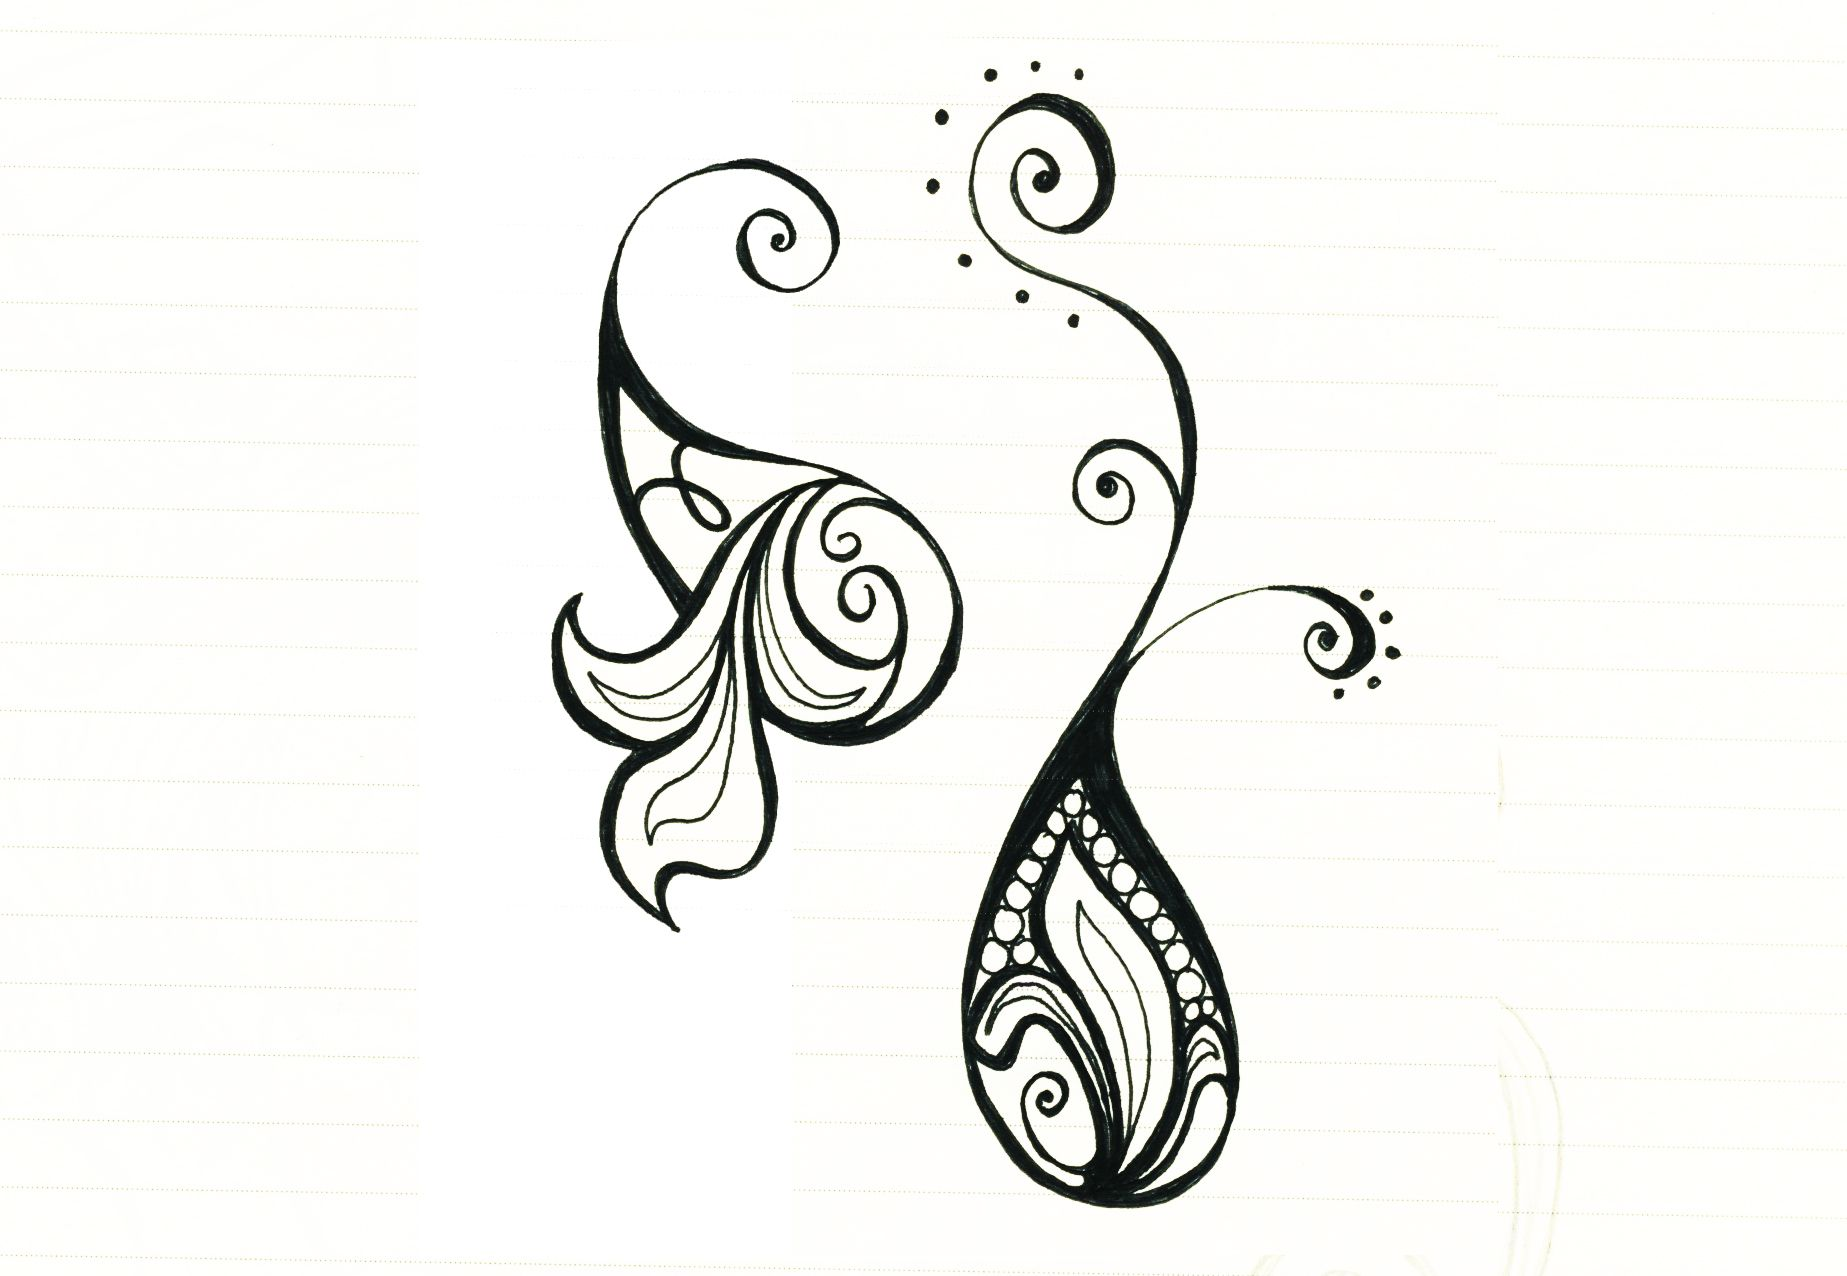 Paisley Paisley tattoo design, Paisley tattoo